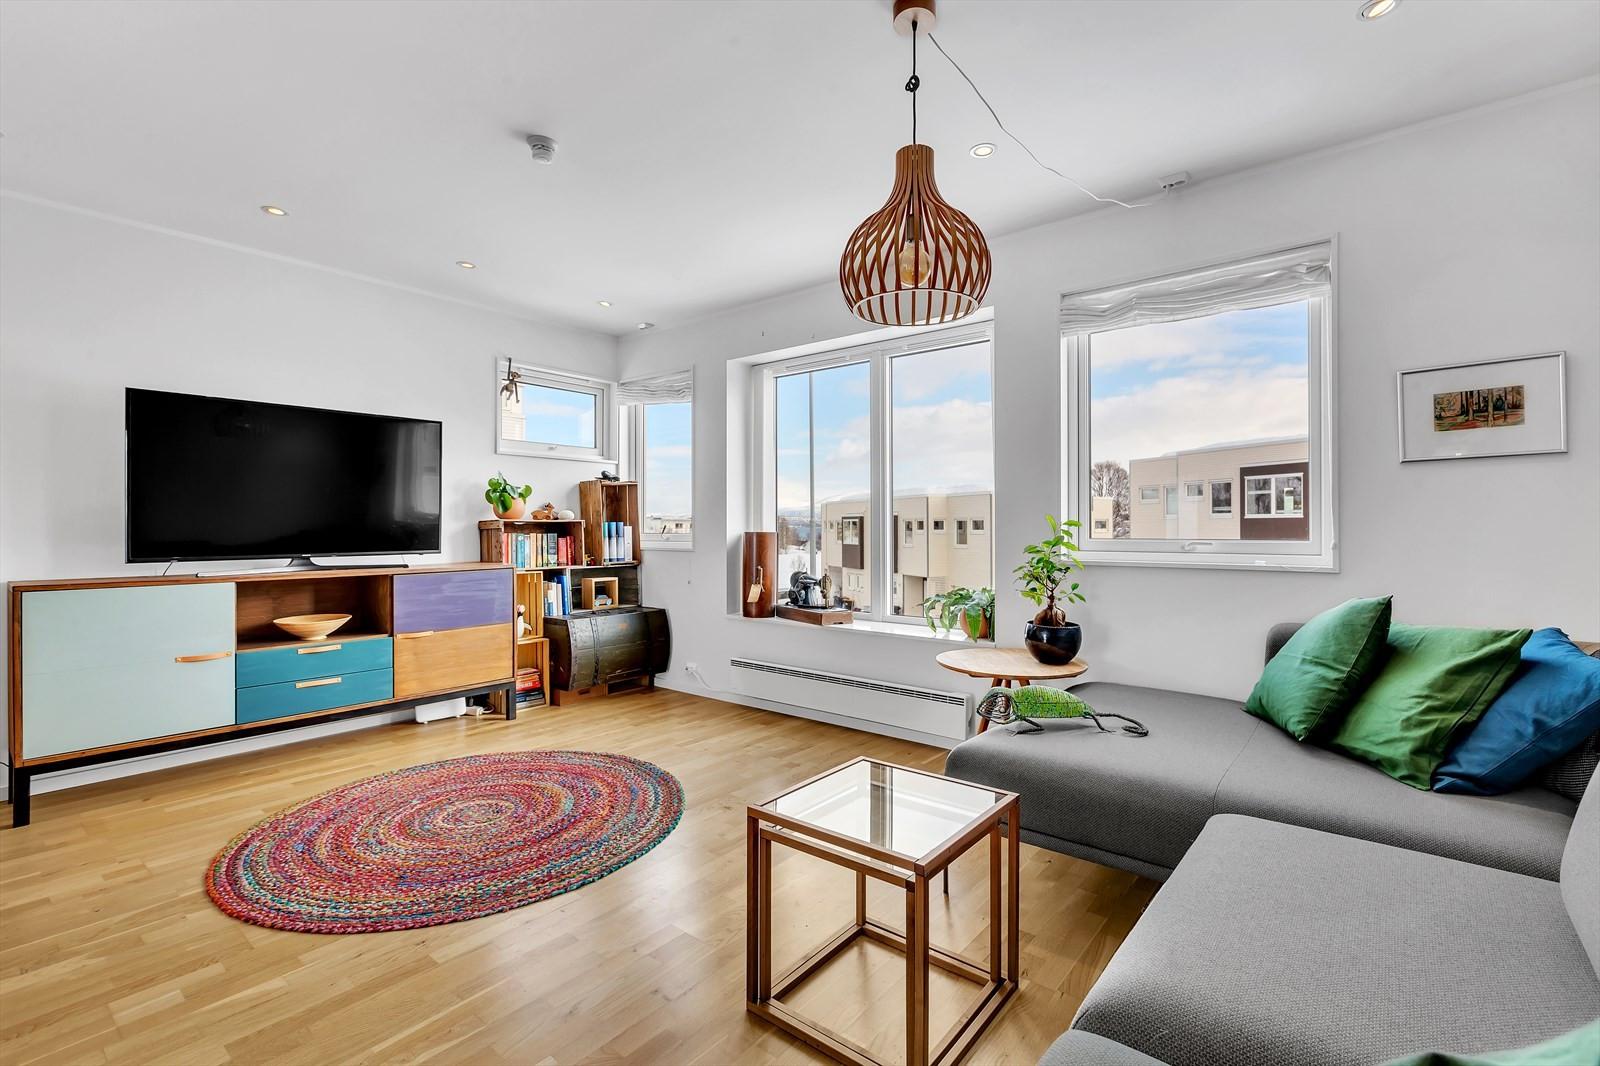 Lys og romslig stue i 2. plan med store vindusflater og himlingsbelysning.